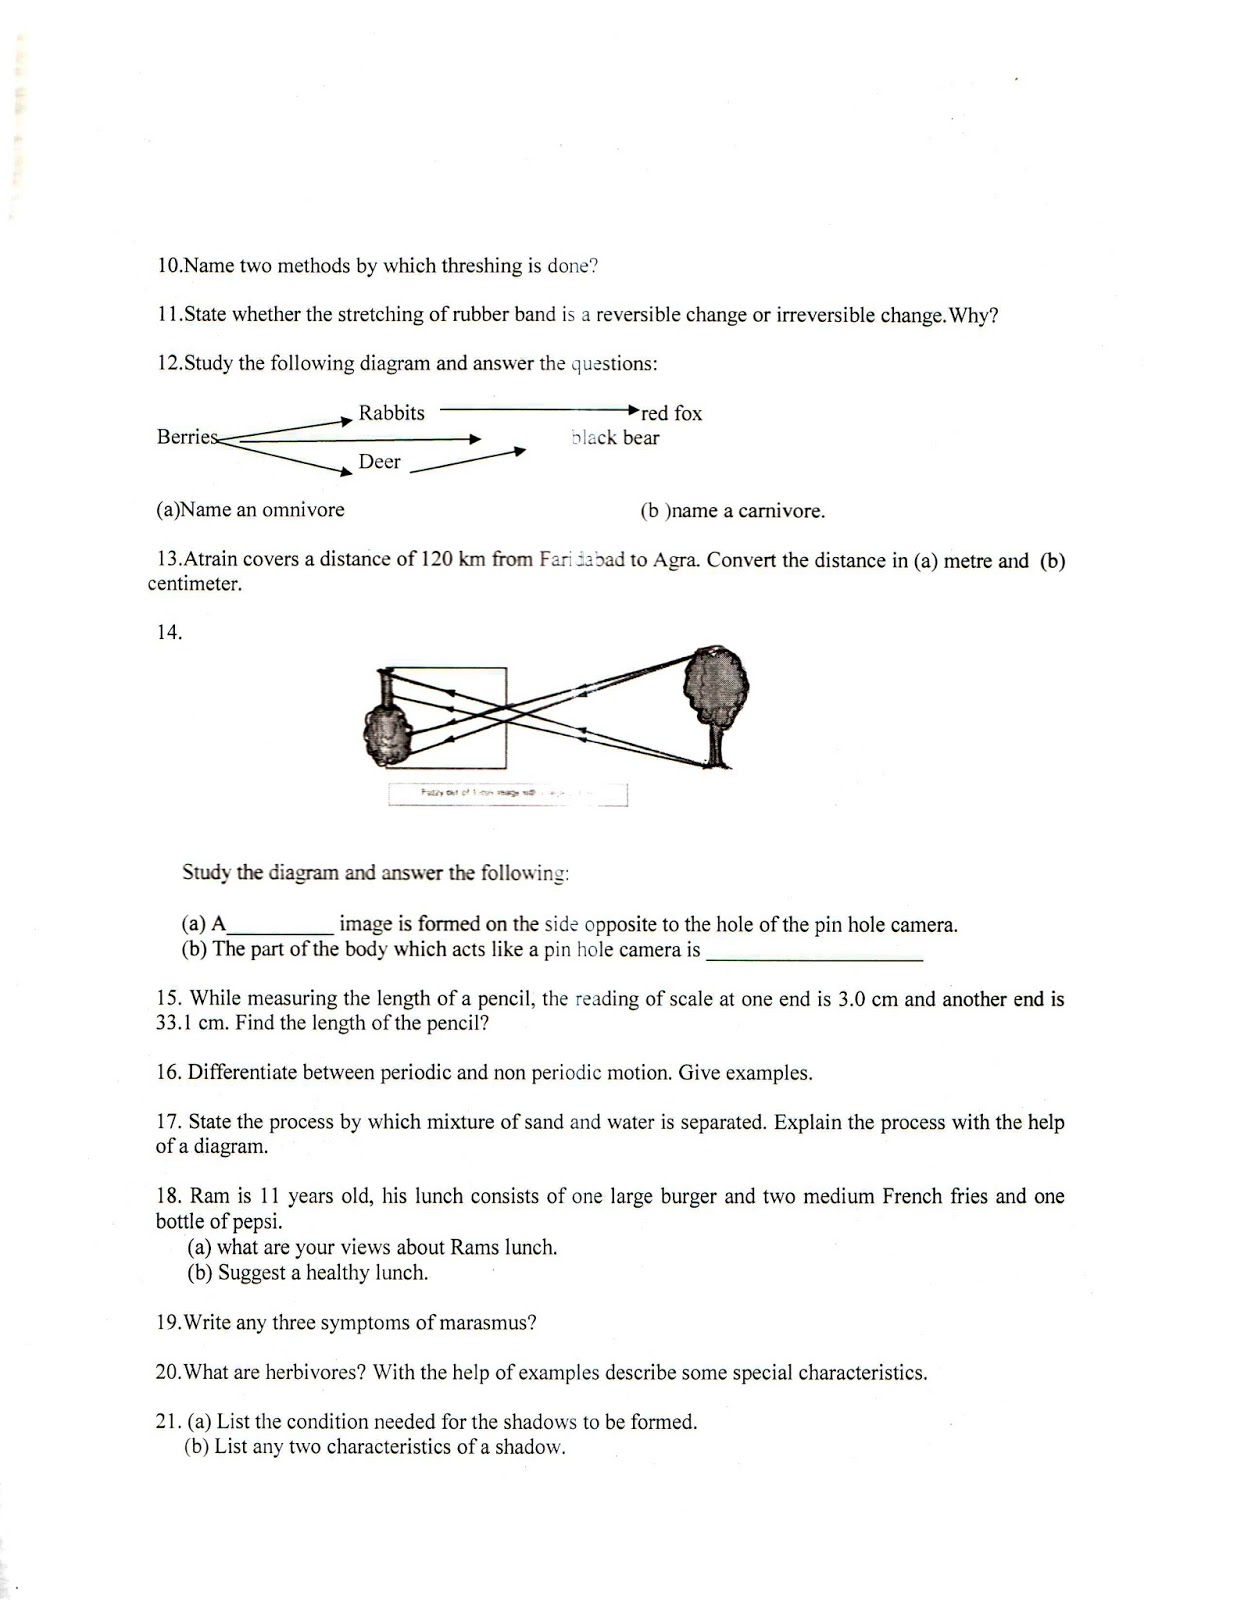 Apsg class 6 science model question paper class 6 science model question paper malvernweather Choice Image